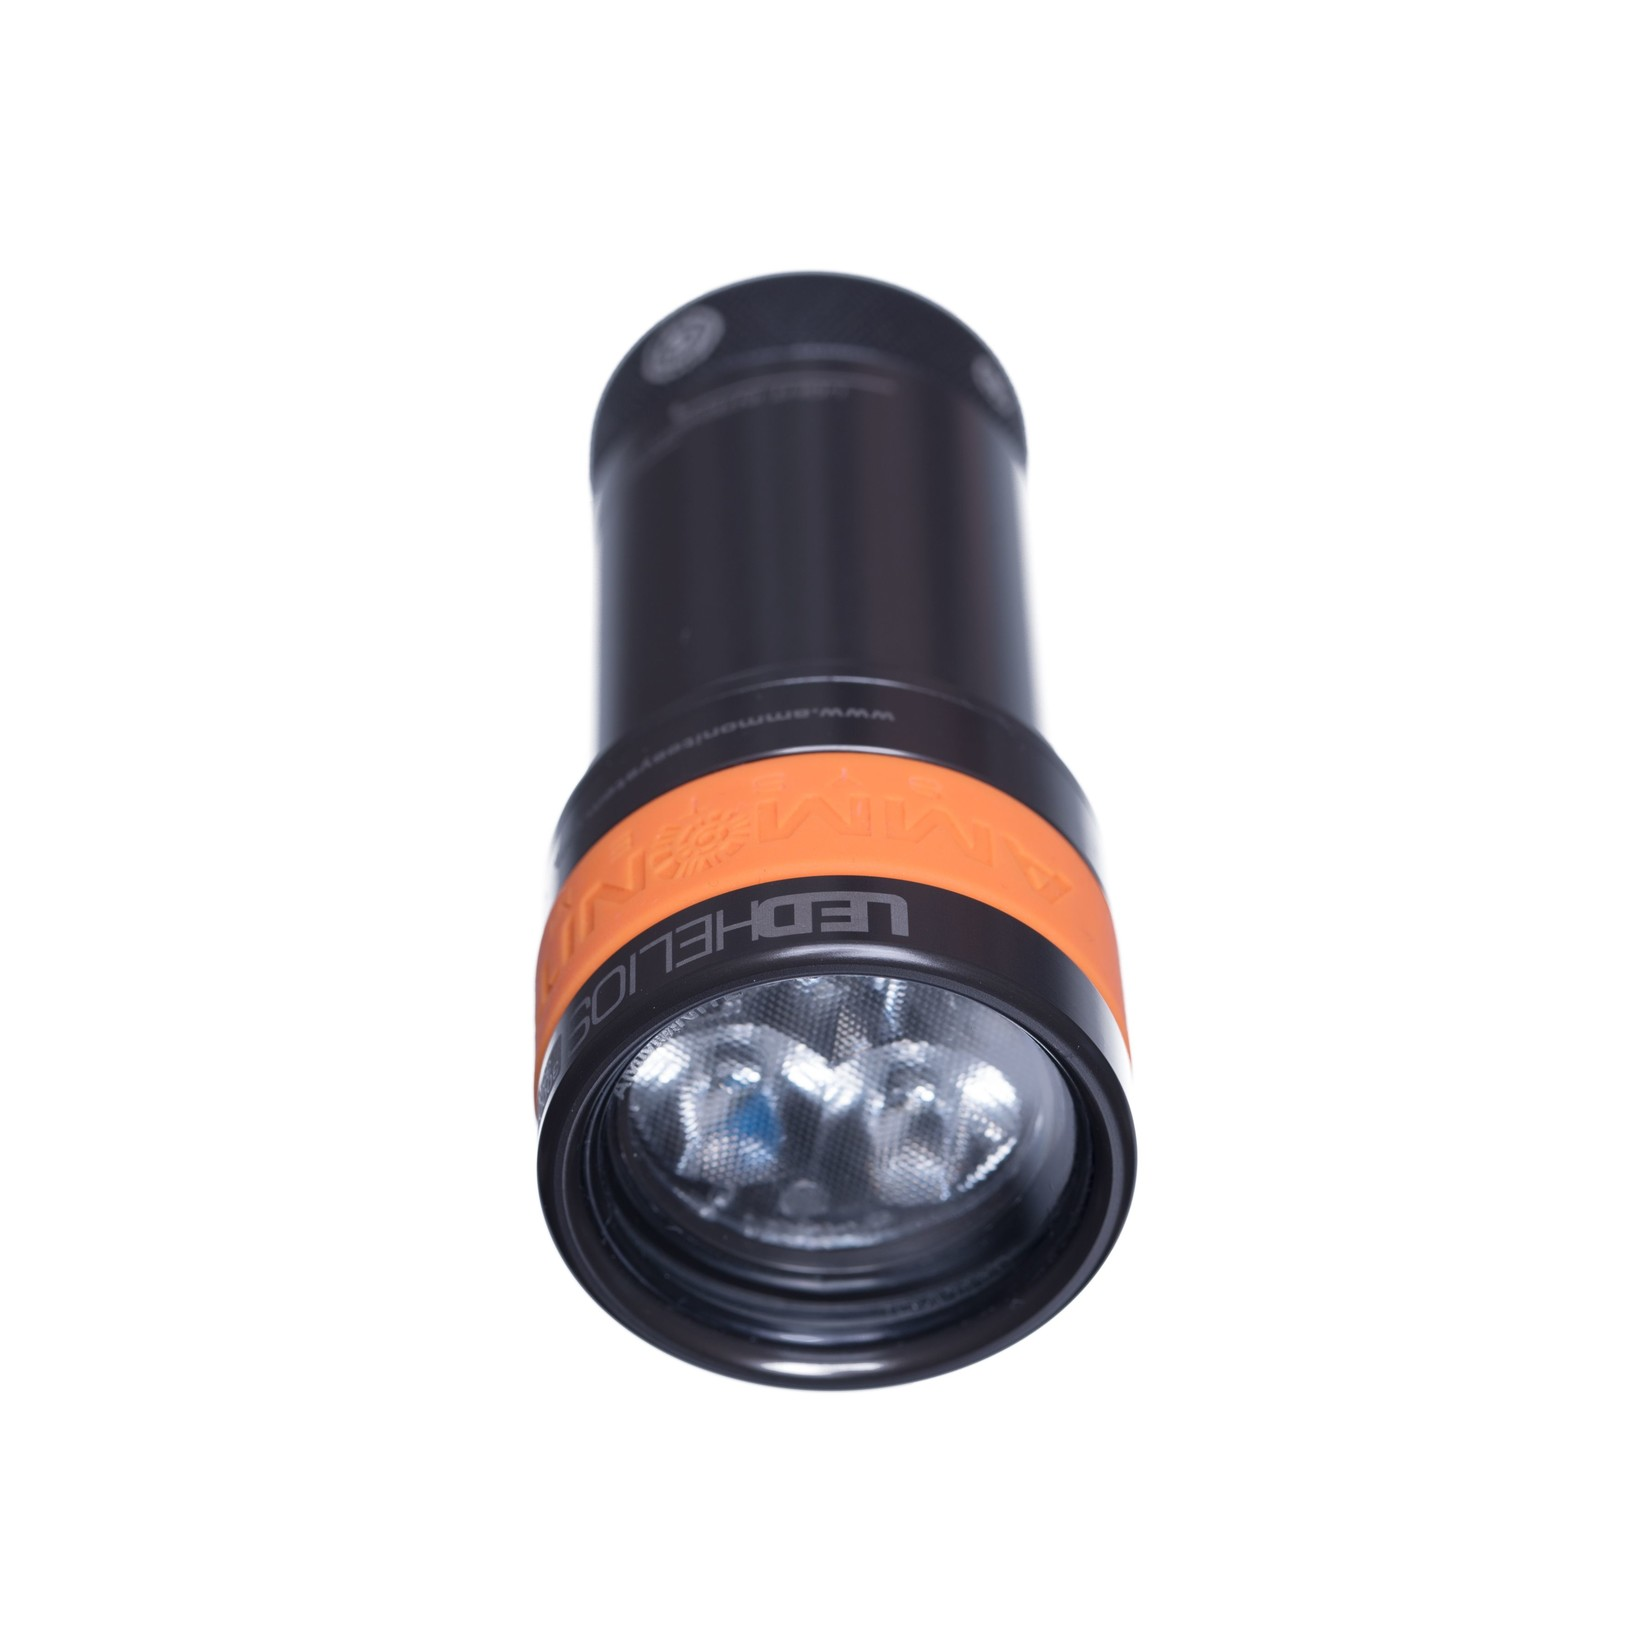 Ammonite Lampkop LED Helios (3000 Imn)